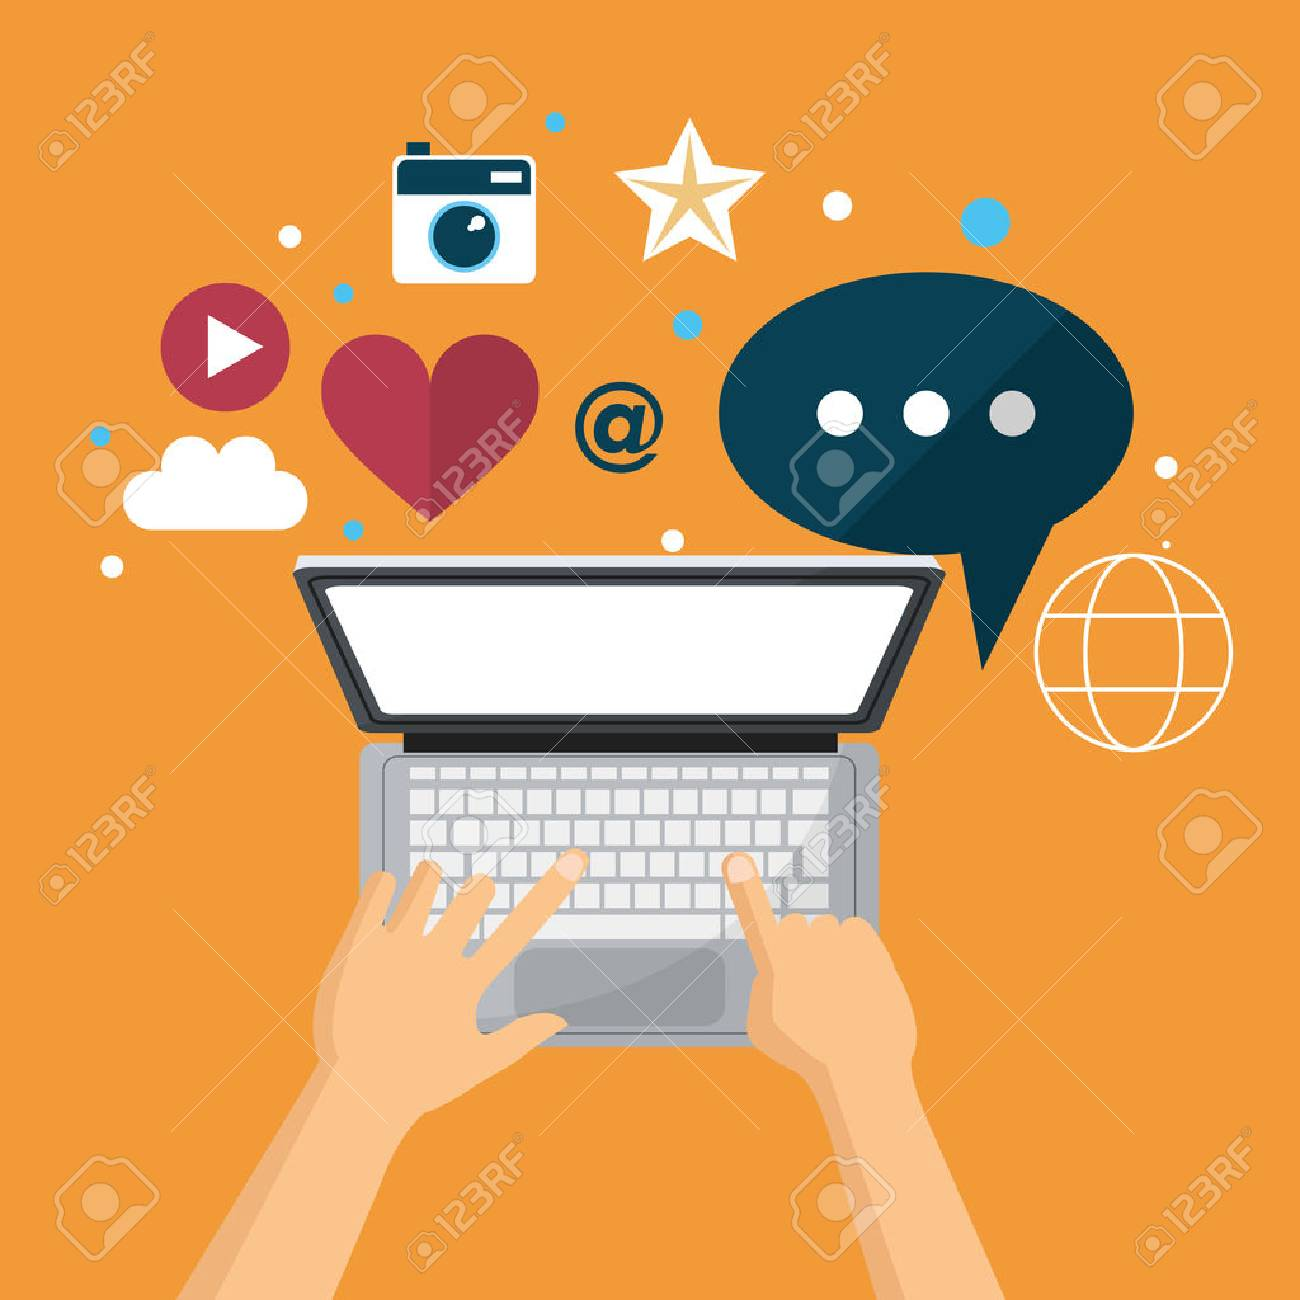 hand using laptop social media network vector illustration eps 10 - 68749126